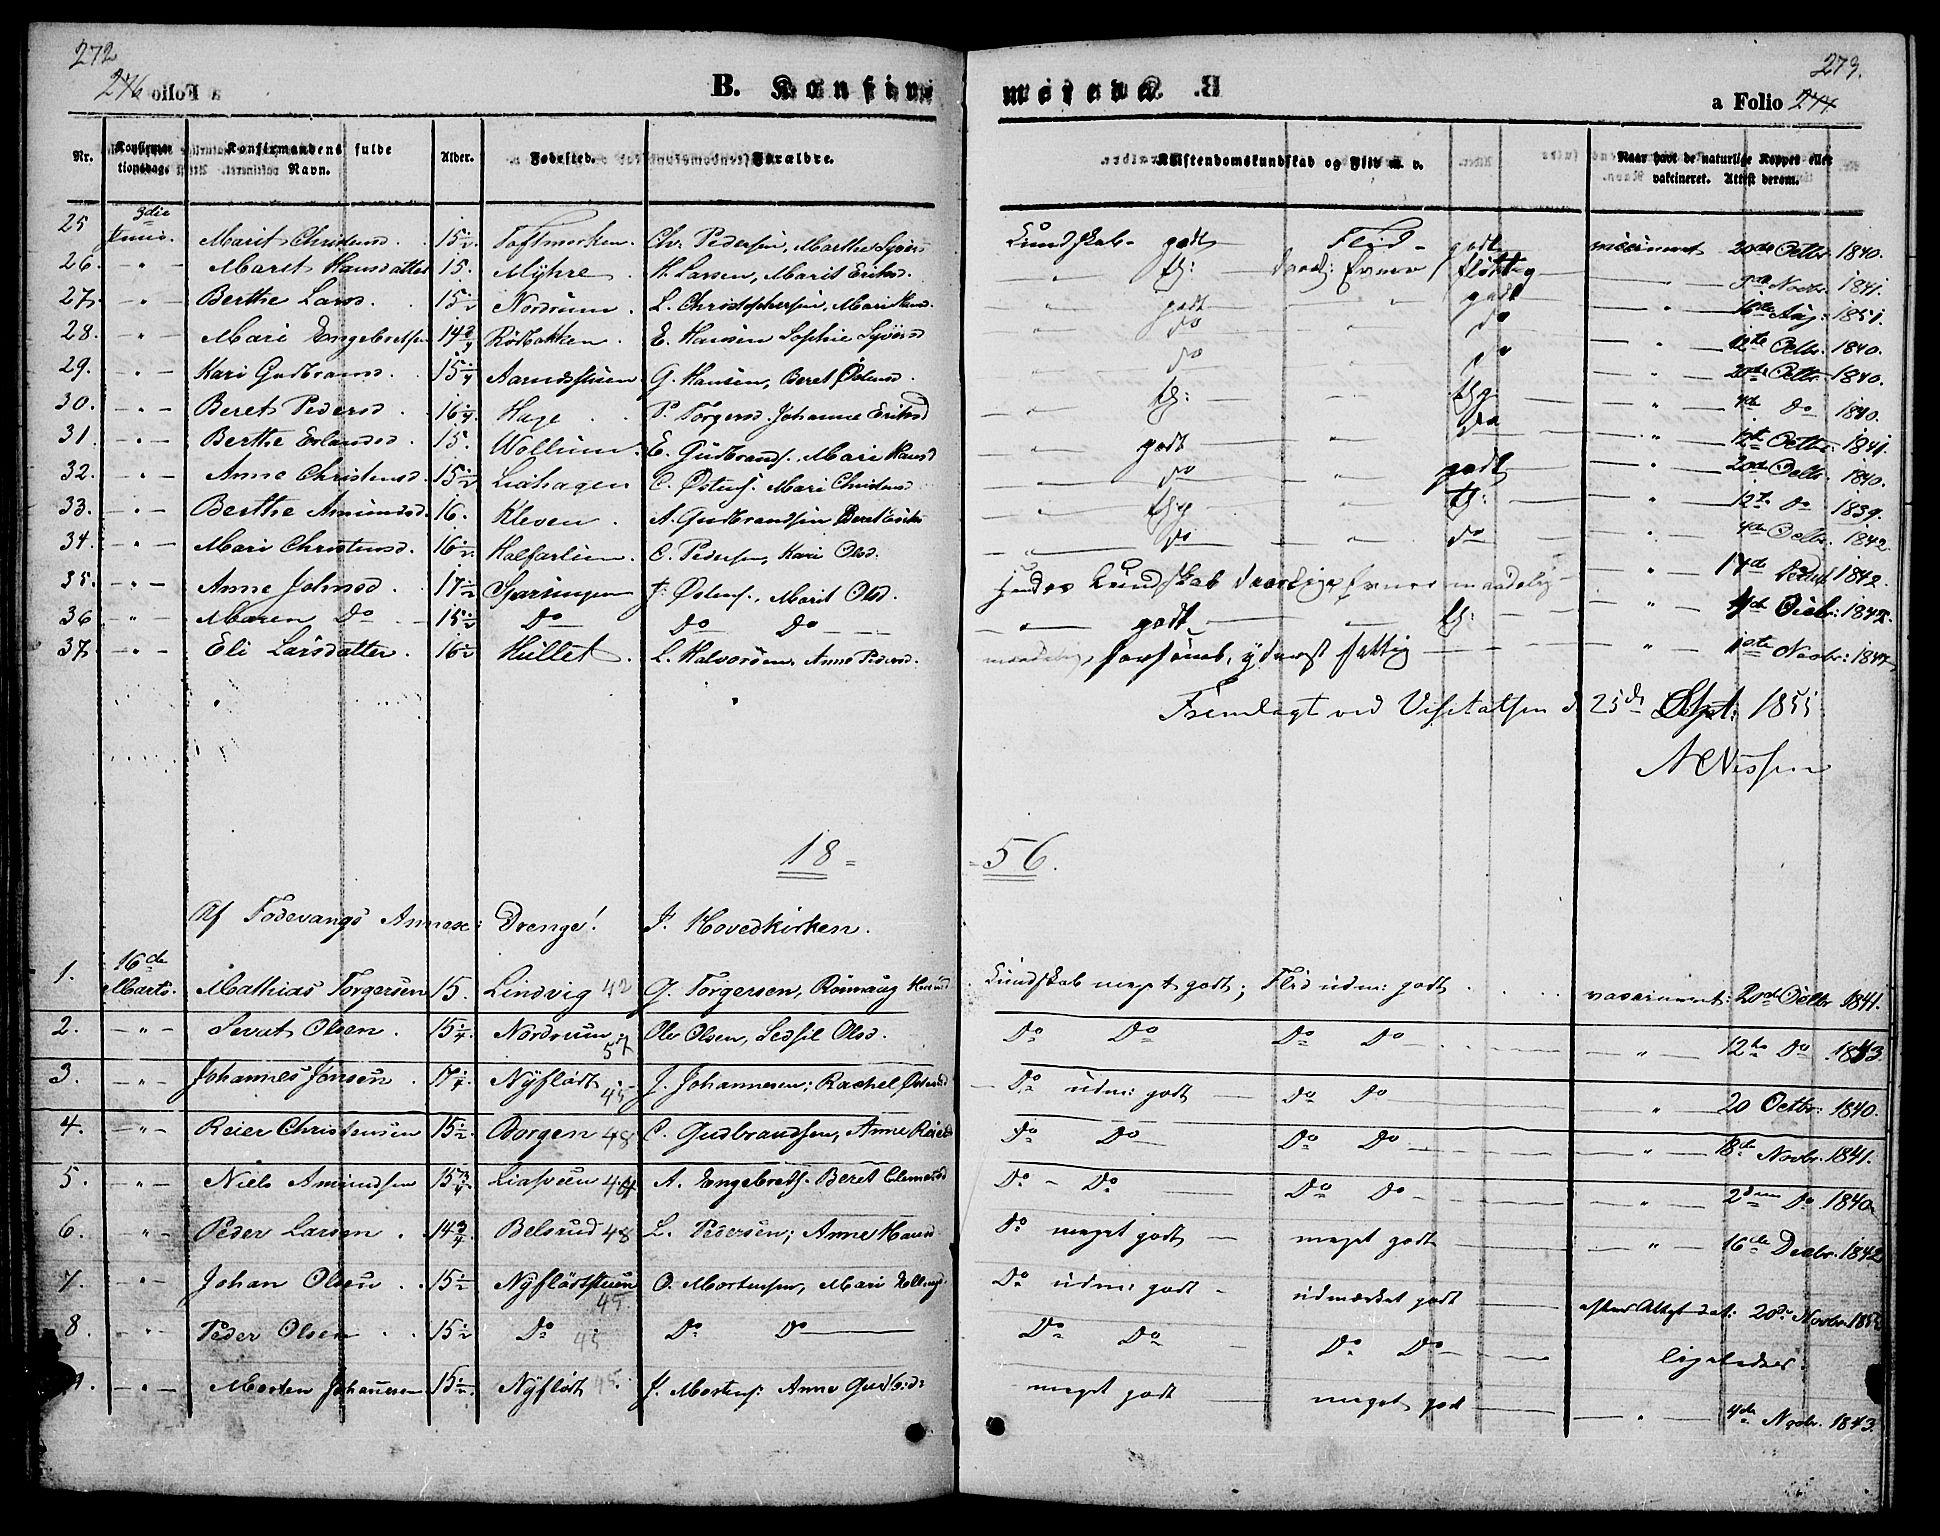 SAH, Ringebu prestekontor, Klokkerbok nr. 3, 1854-1866, s. 272-273